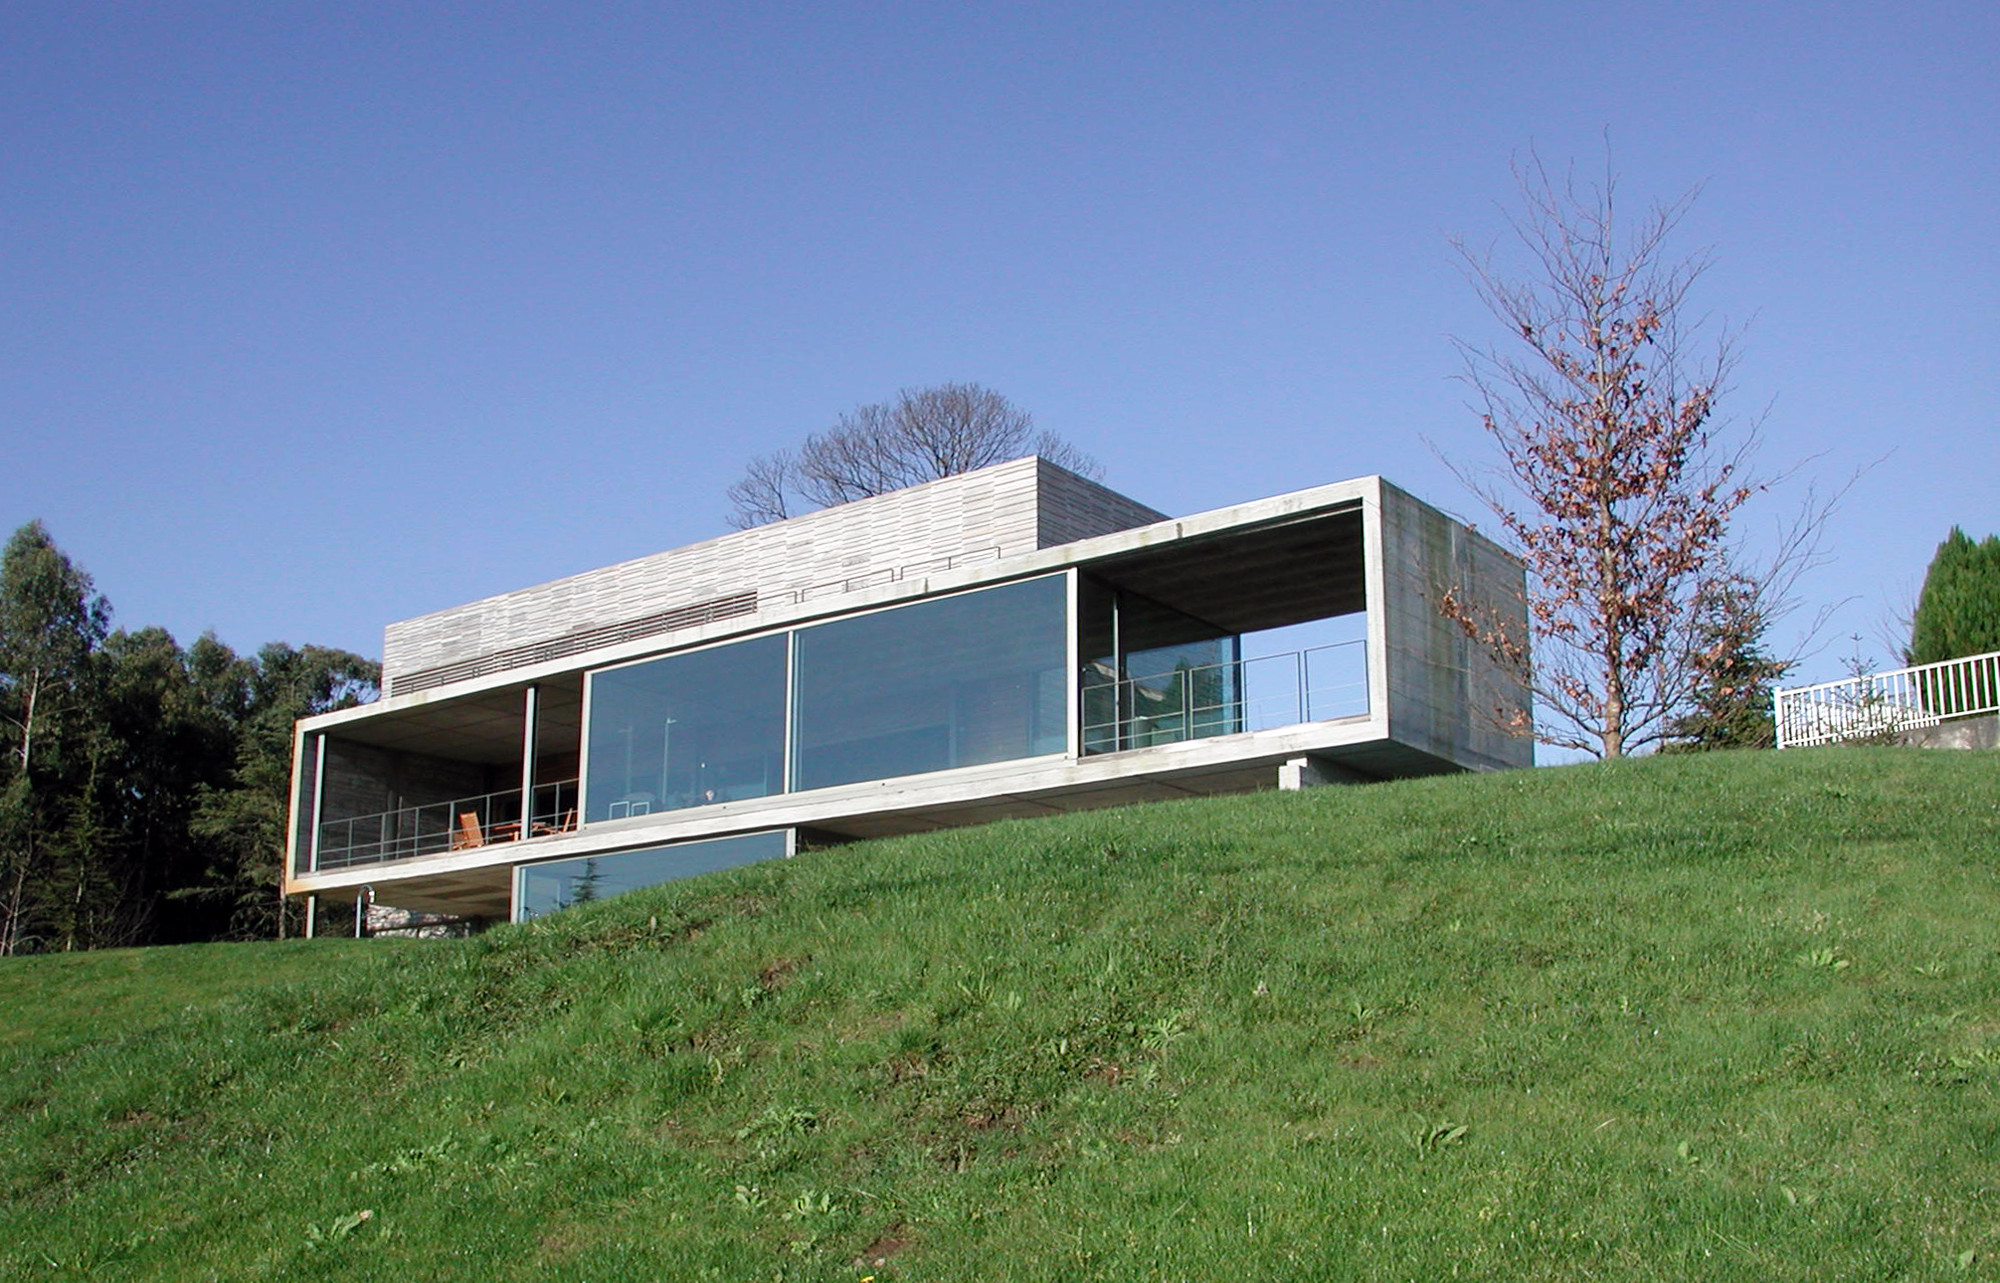 House in Perbes / Vier Arquitectos, Courtesy of Vier Arquitectos